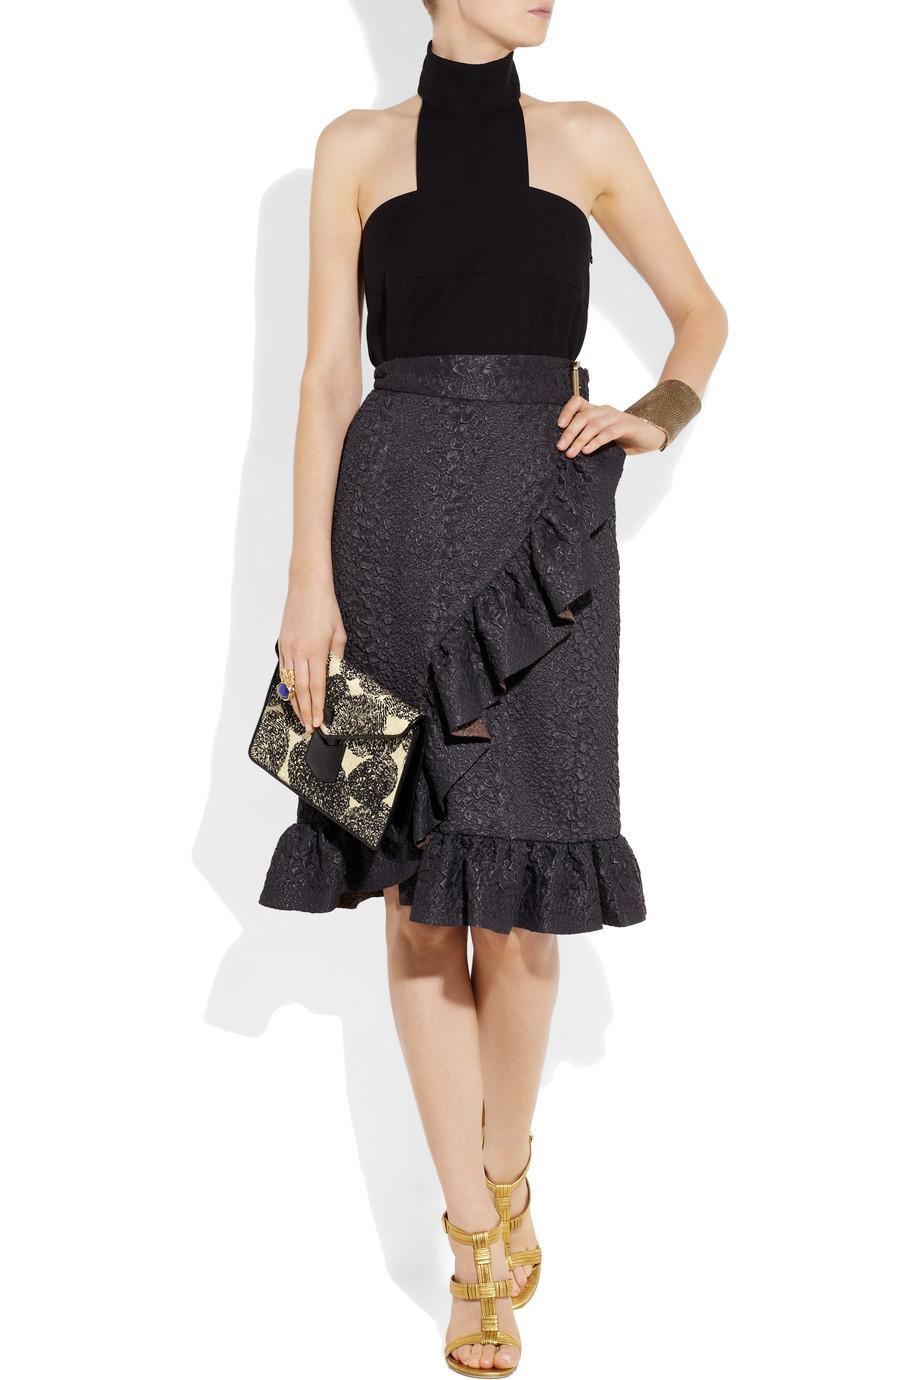 belle de jour bag - Saint laurent Leather-trimmed Printed Woven Clutch in Black | Lyst